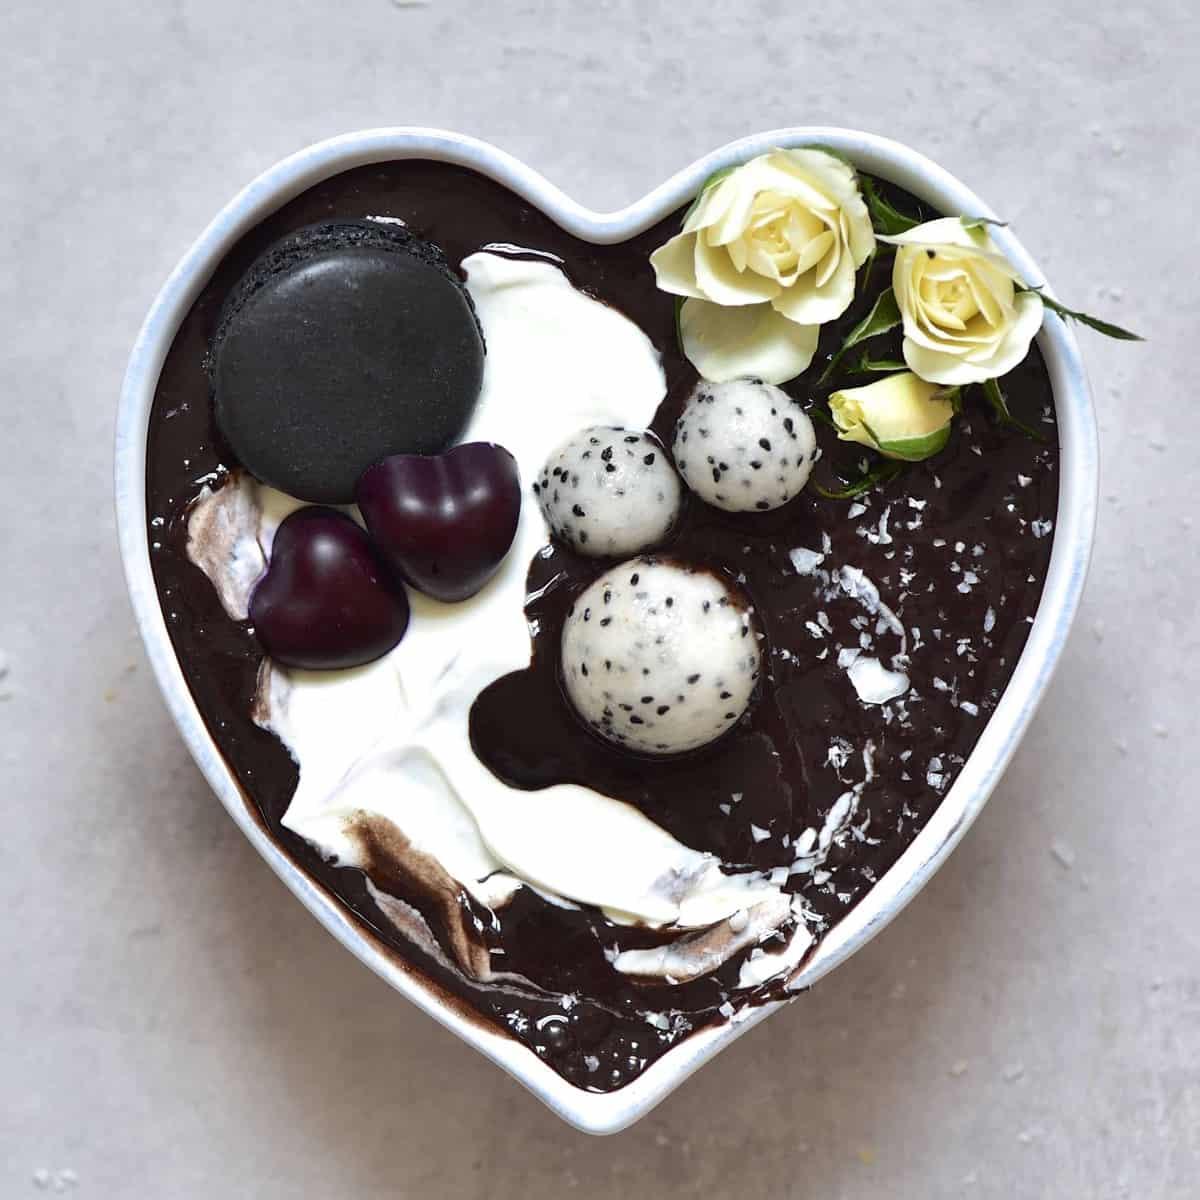 Black cacao smoothie with yogurt